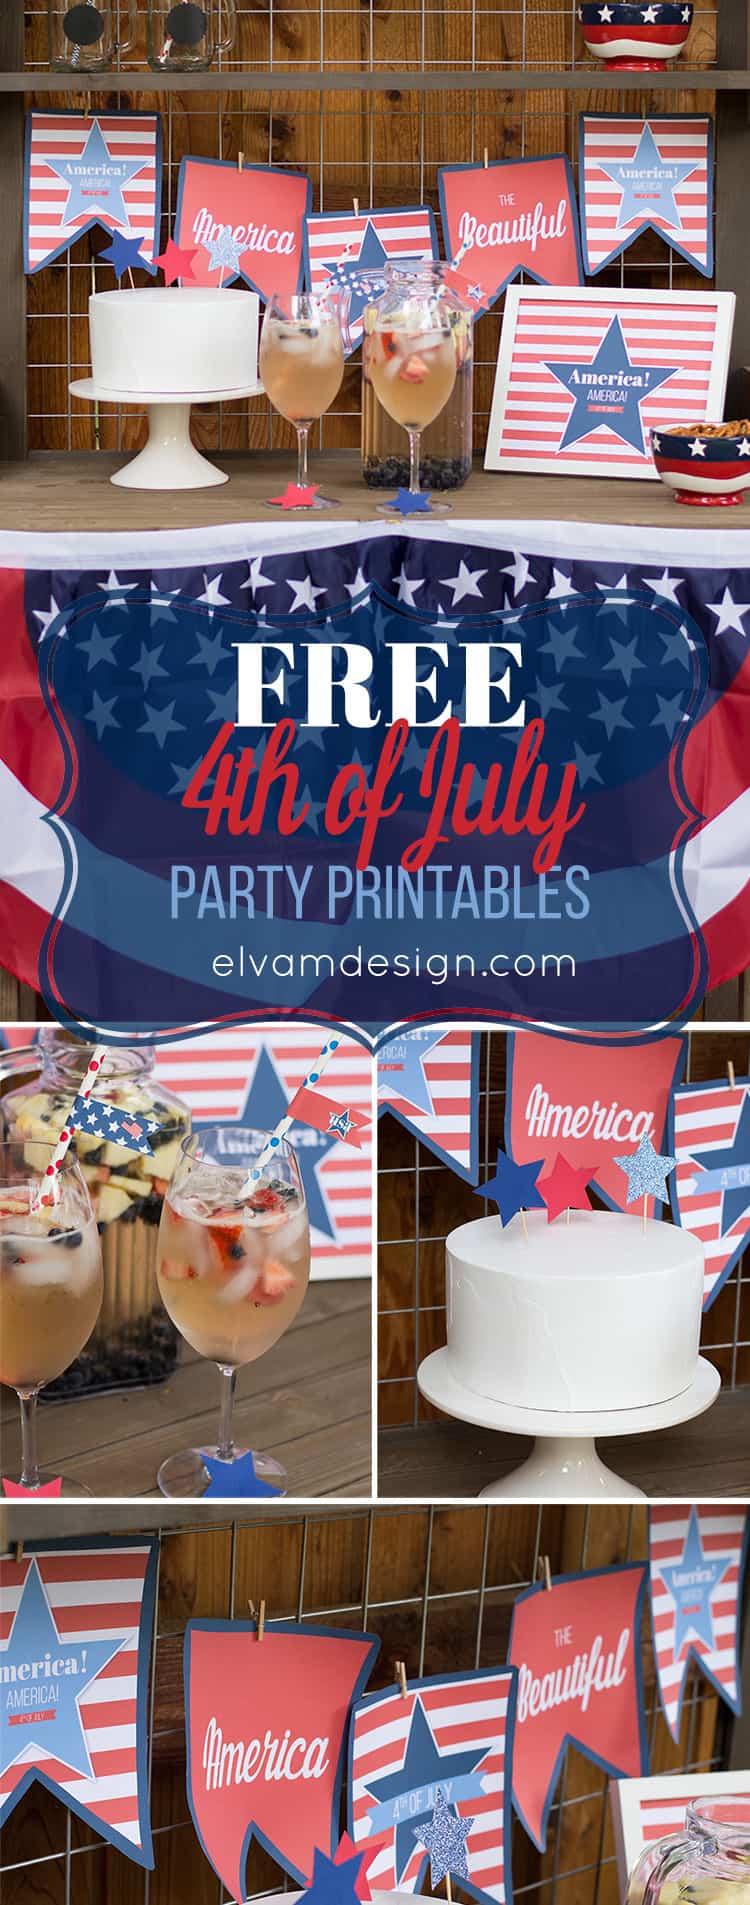 Free Printable 4th of July Decor from Elva M Design Studio